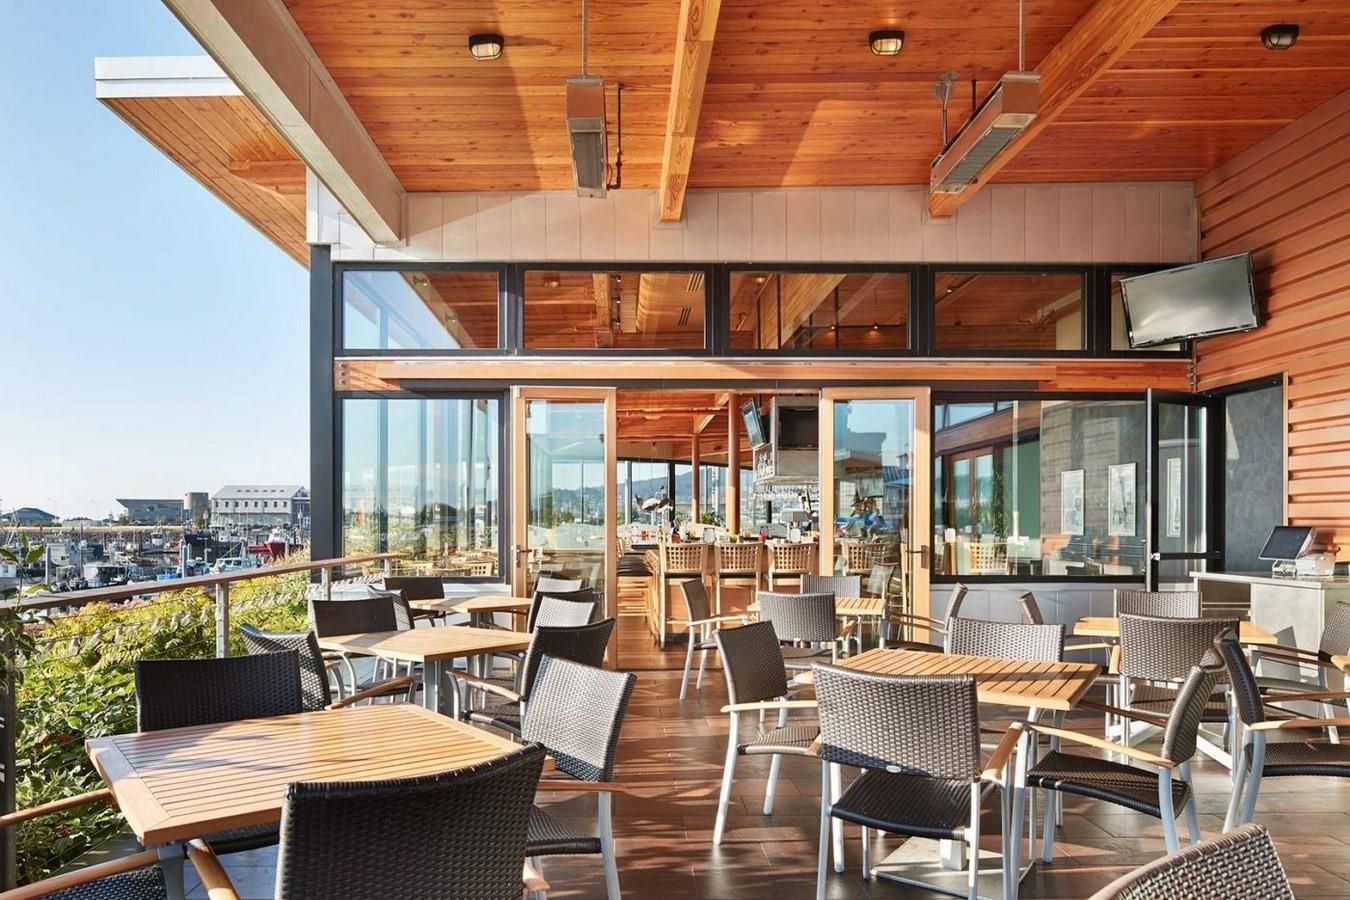 Anthony's Restaurants (Multiple Locations, Washington) - Sheet1